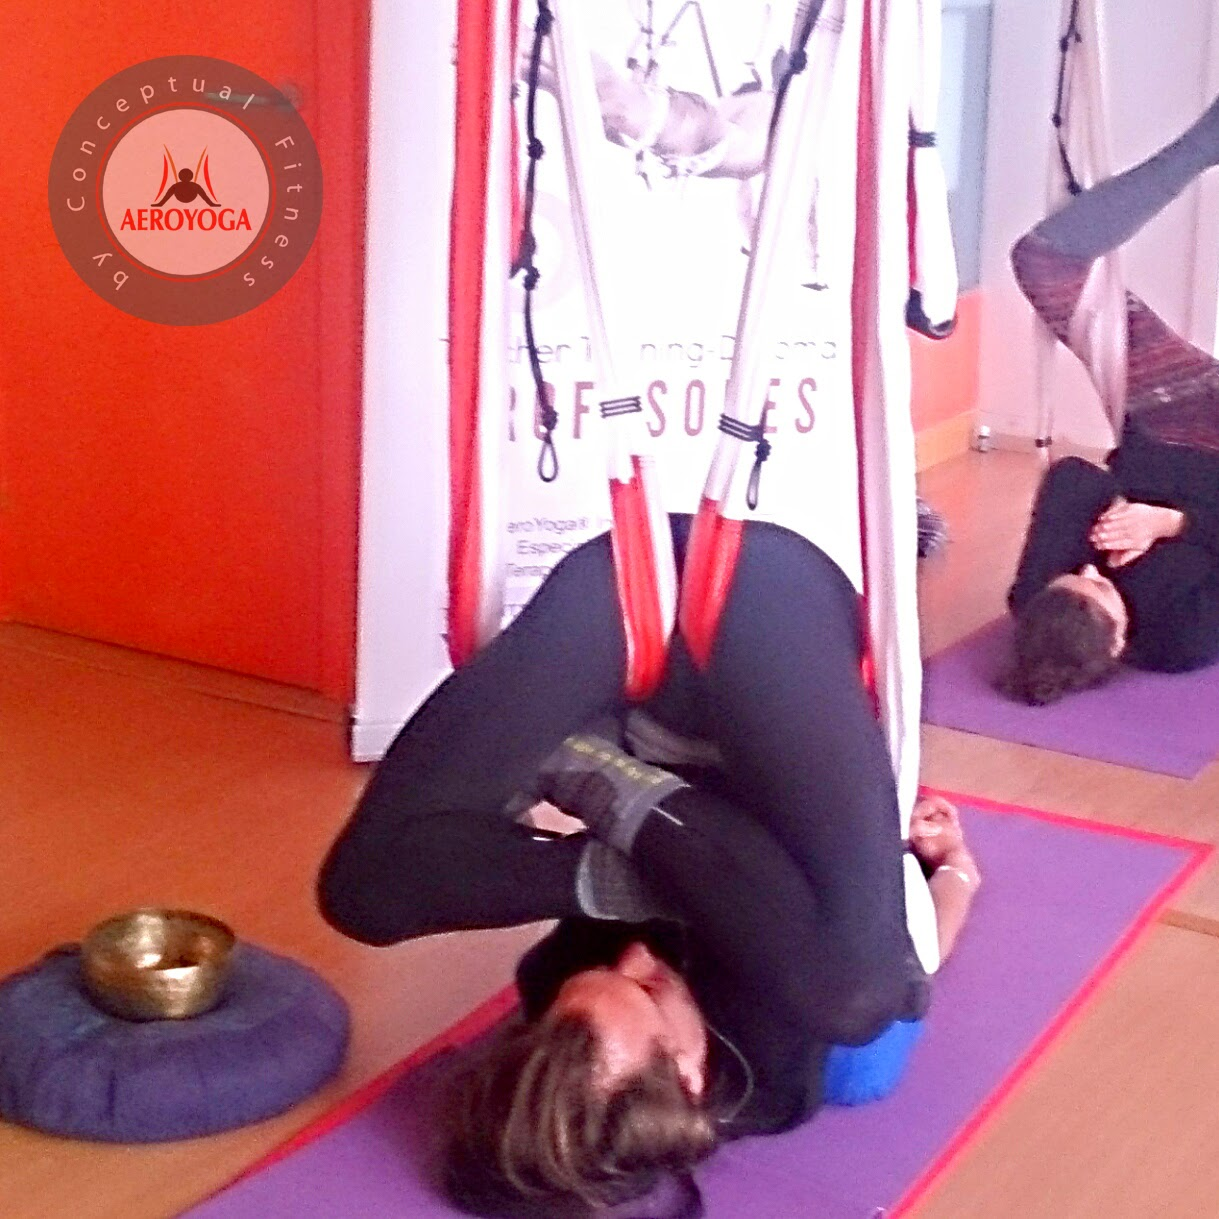 Yoga Dans L'Air dans un Hamac, Yoga Volant